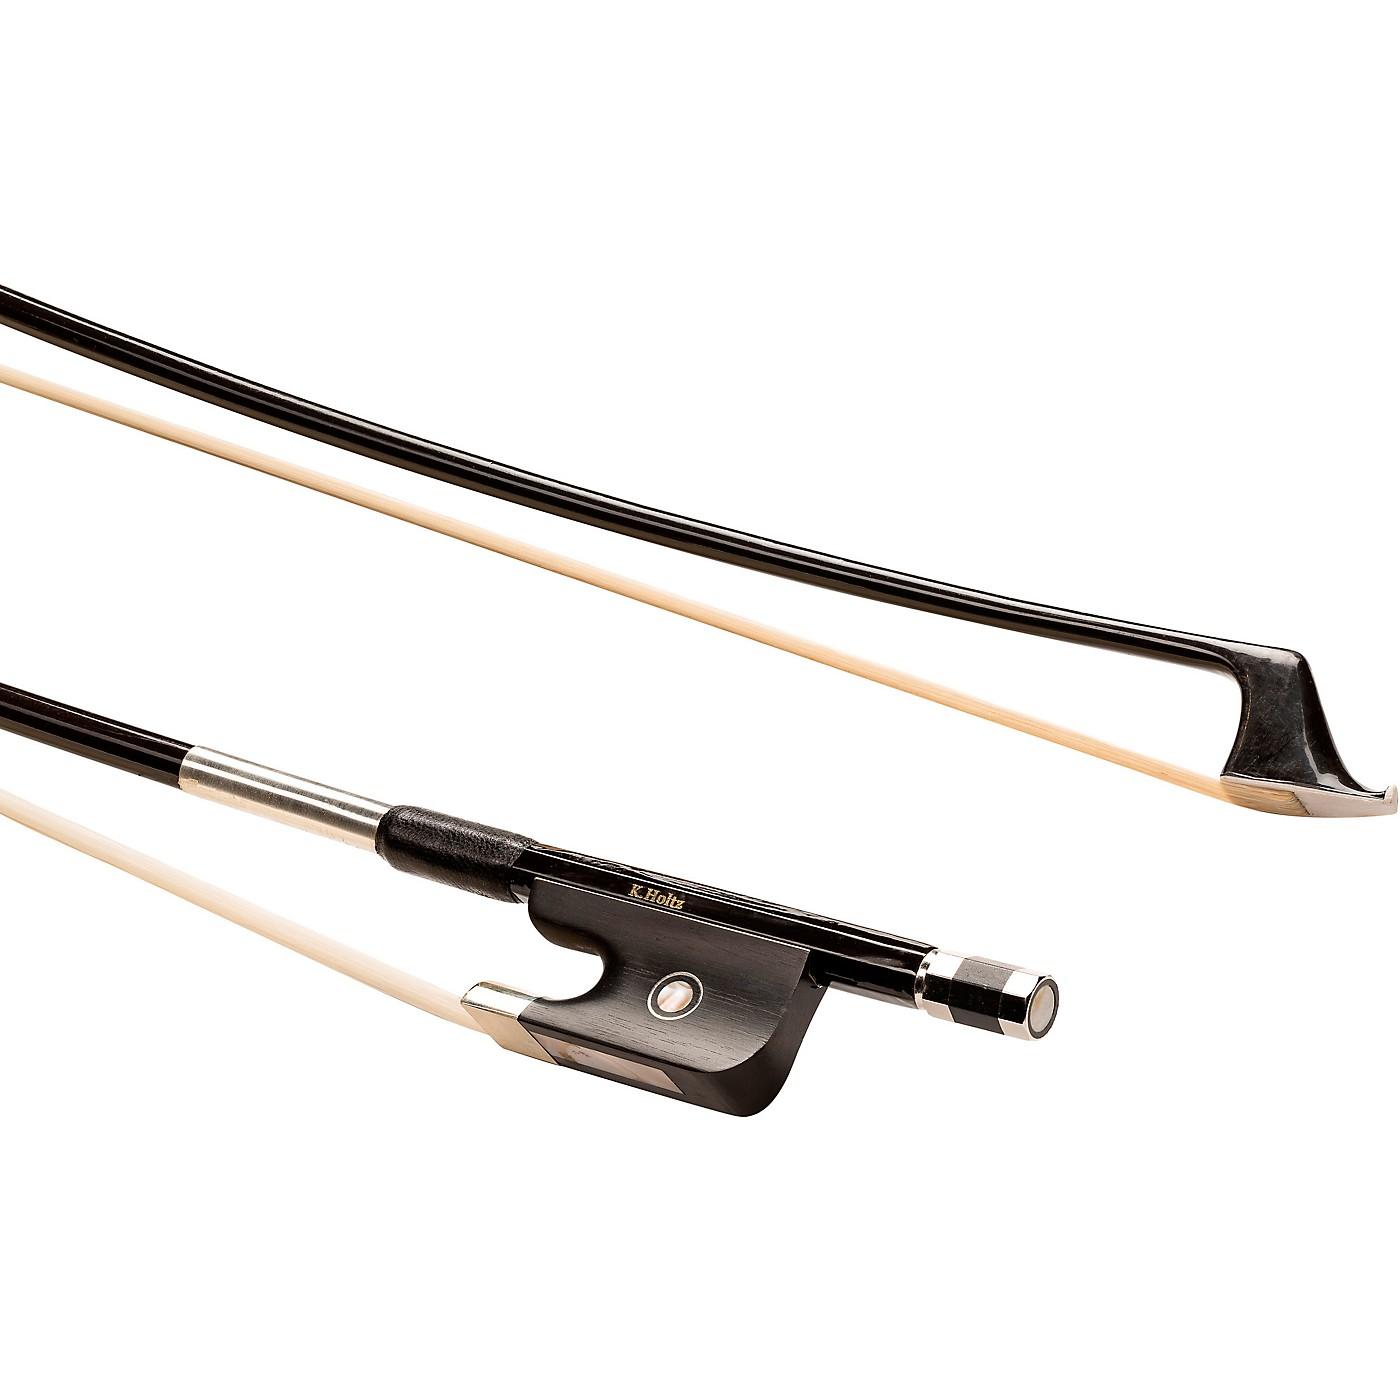 K Holtz BB10F FG Series Fiberglass French Bass Bow thumbnail